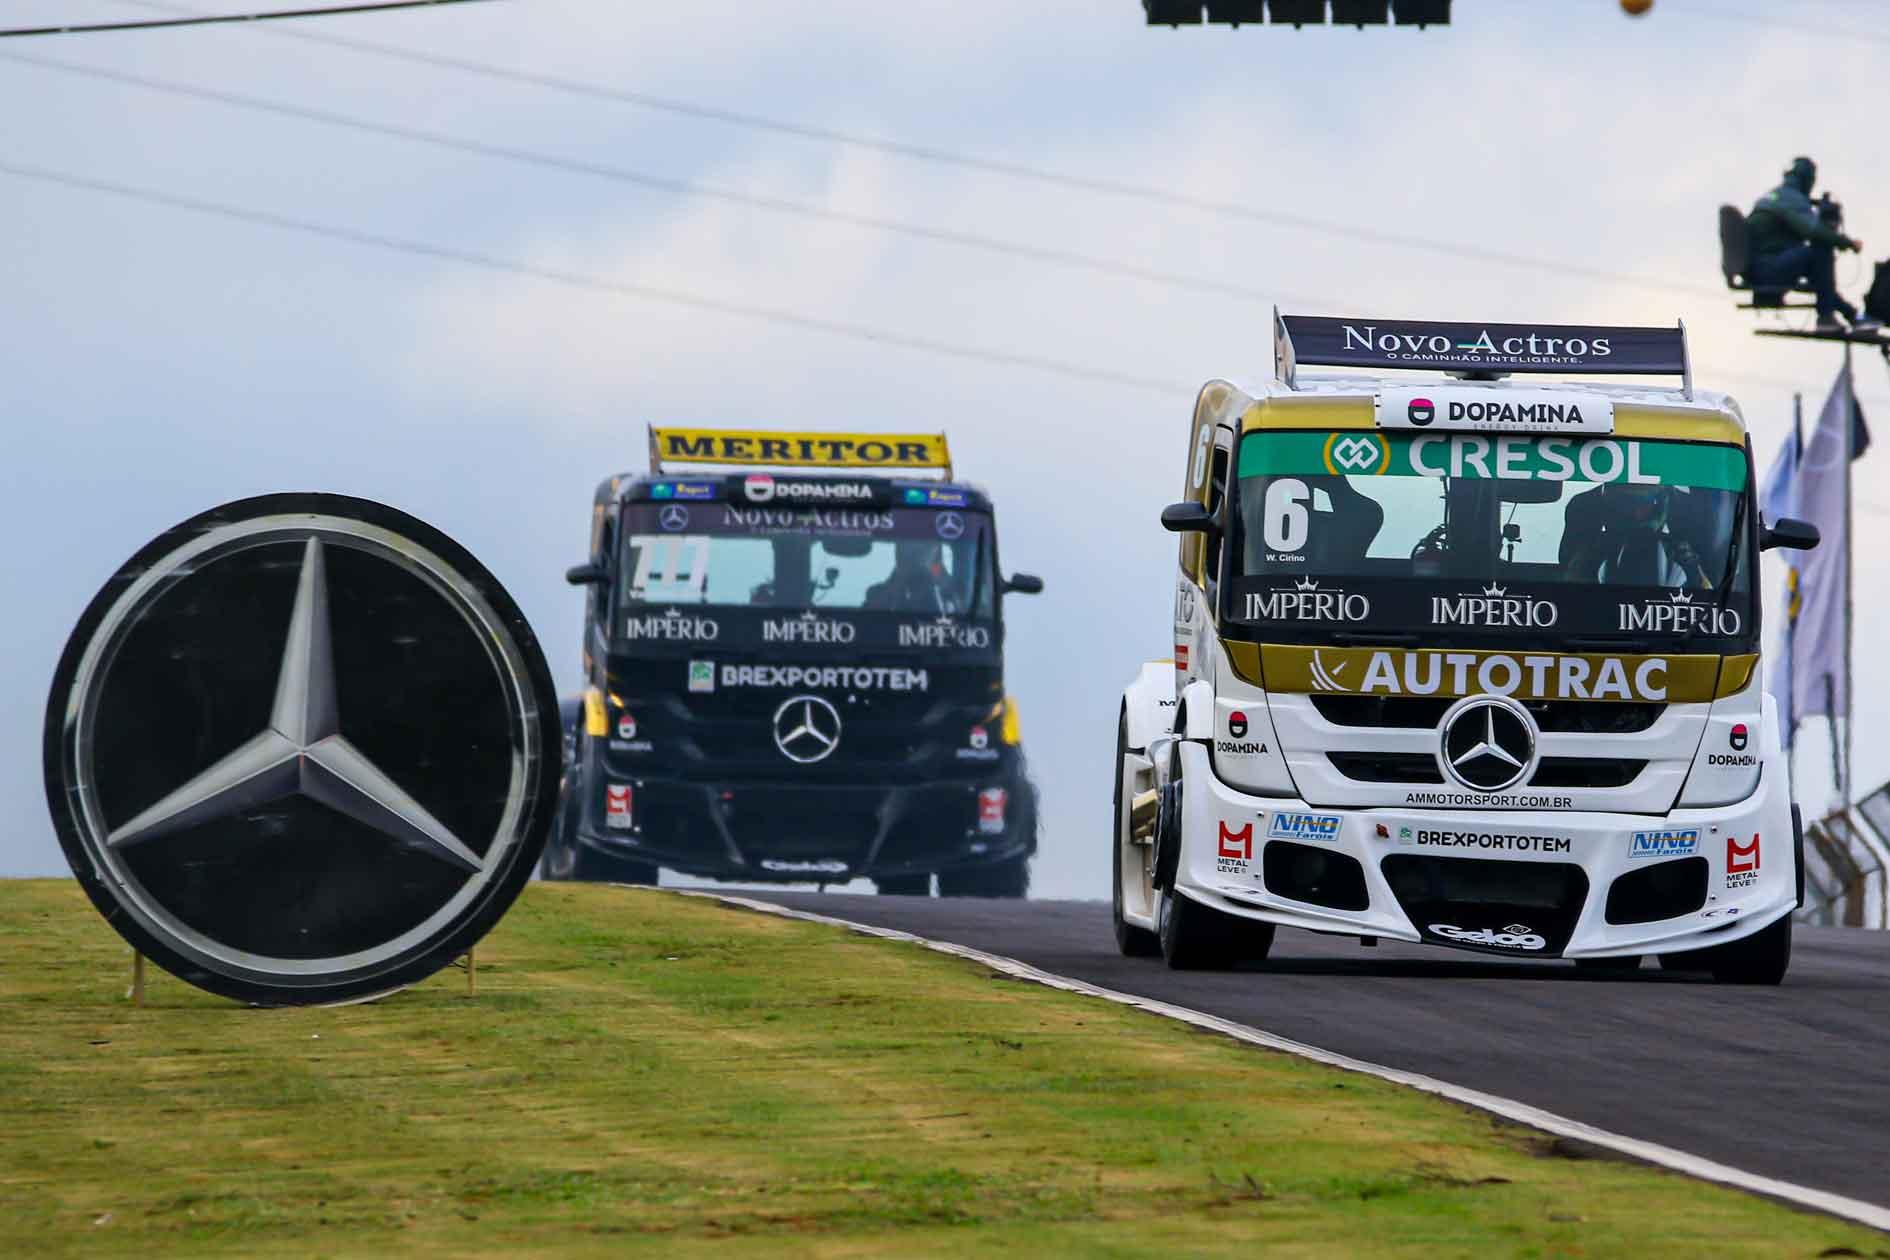 Mercedes-Benz lidera entre as montadoras após duas etapas